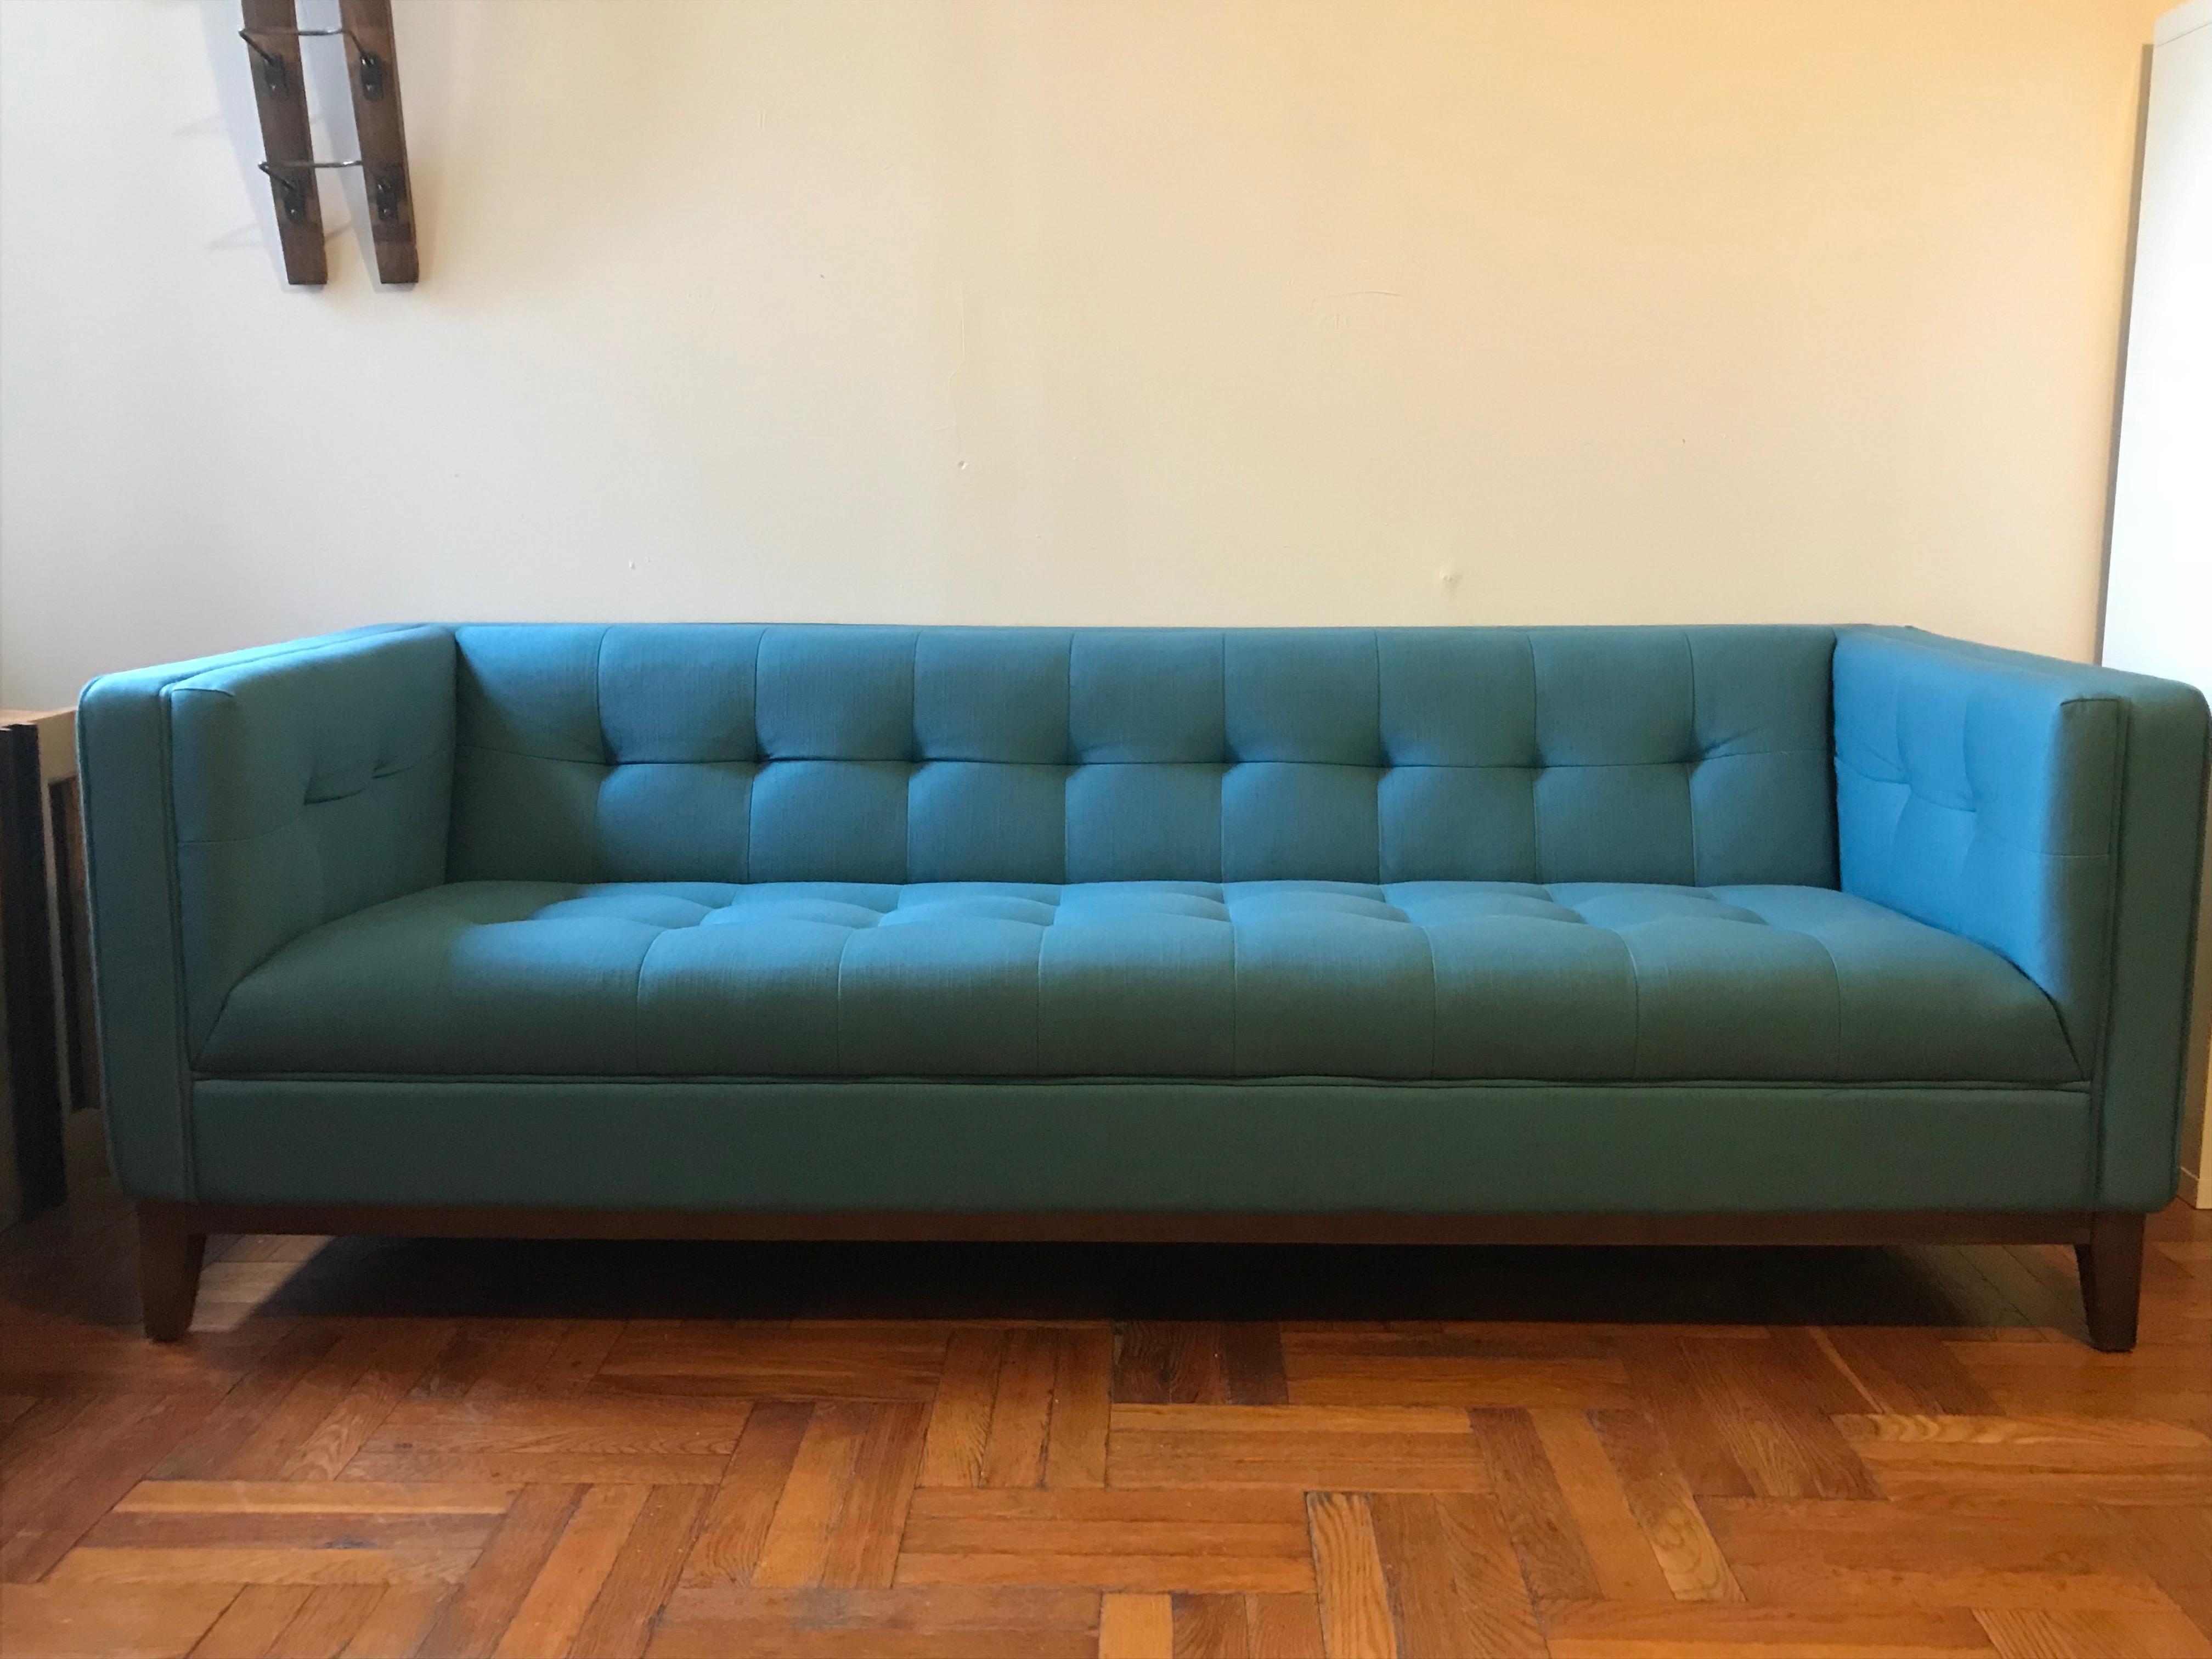 gus modern sofa sale klippan three seat cover atwood  home decor 88